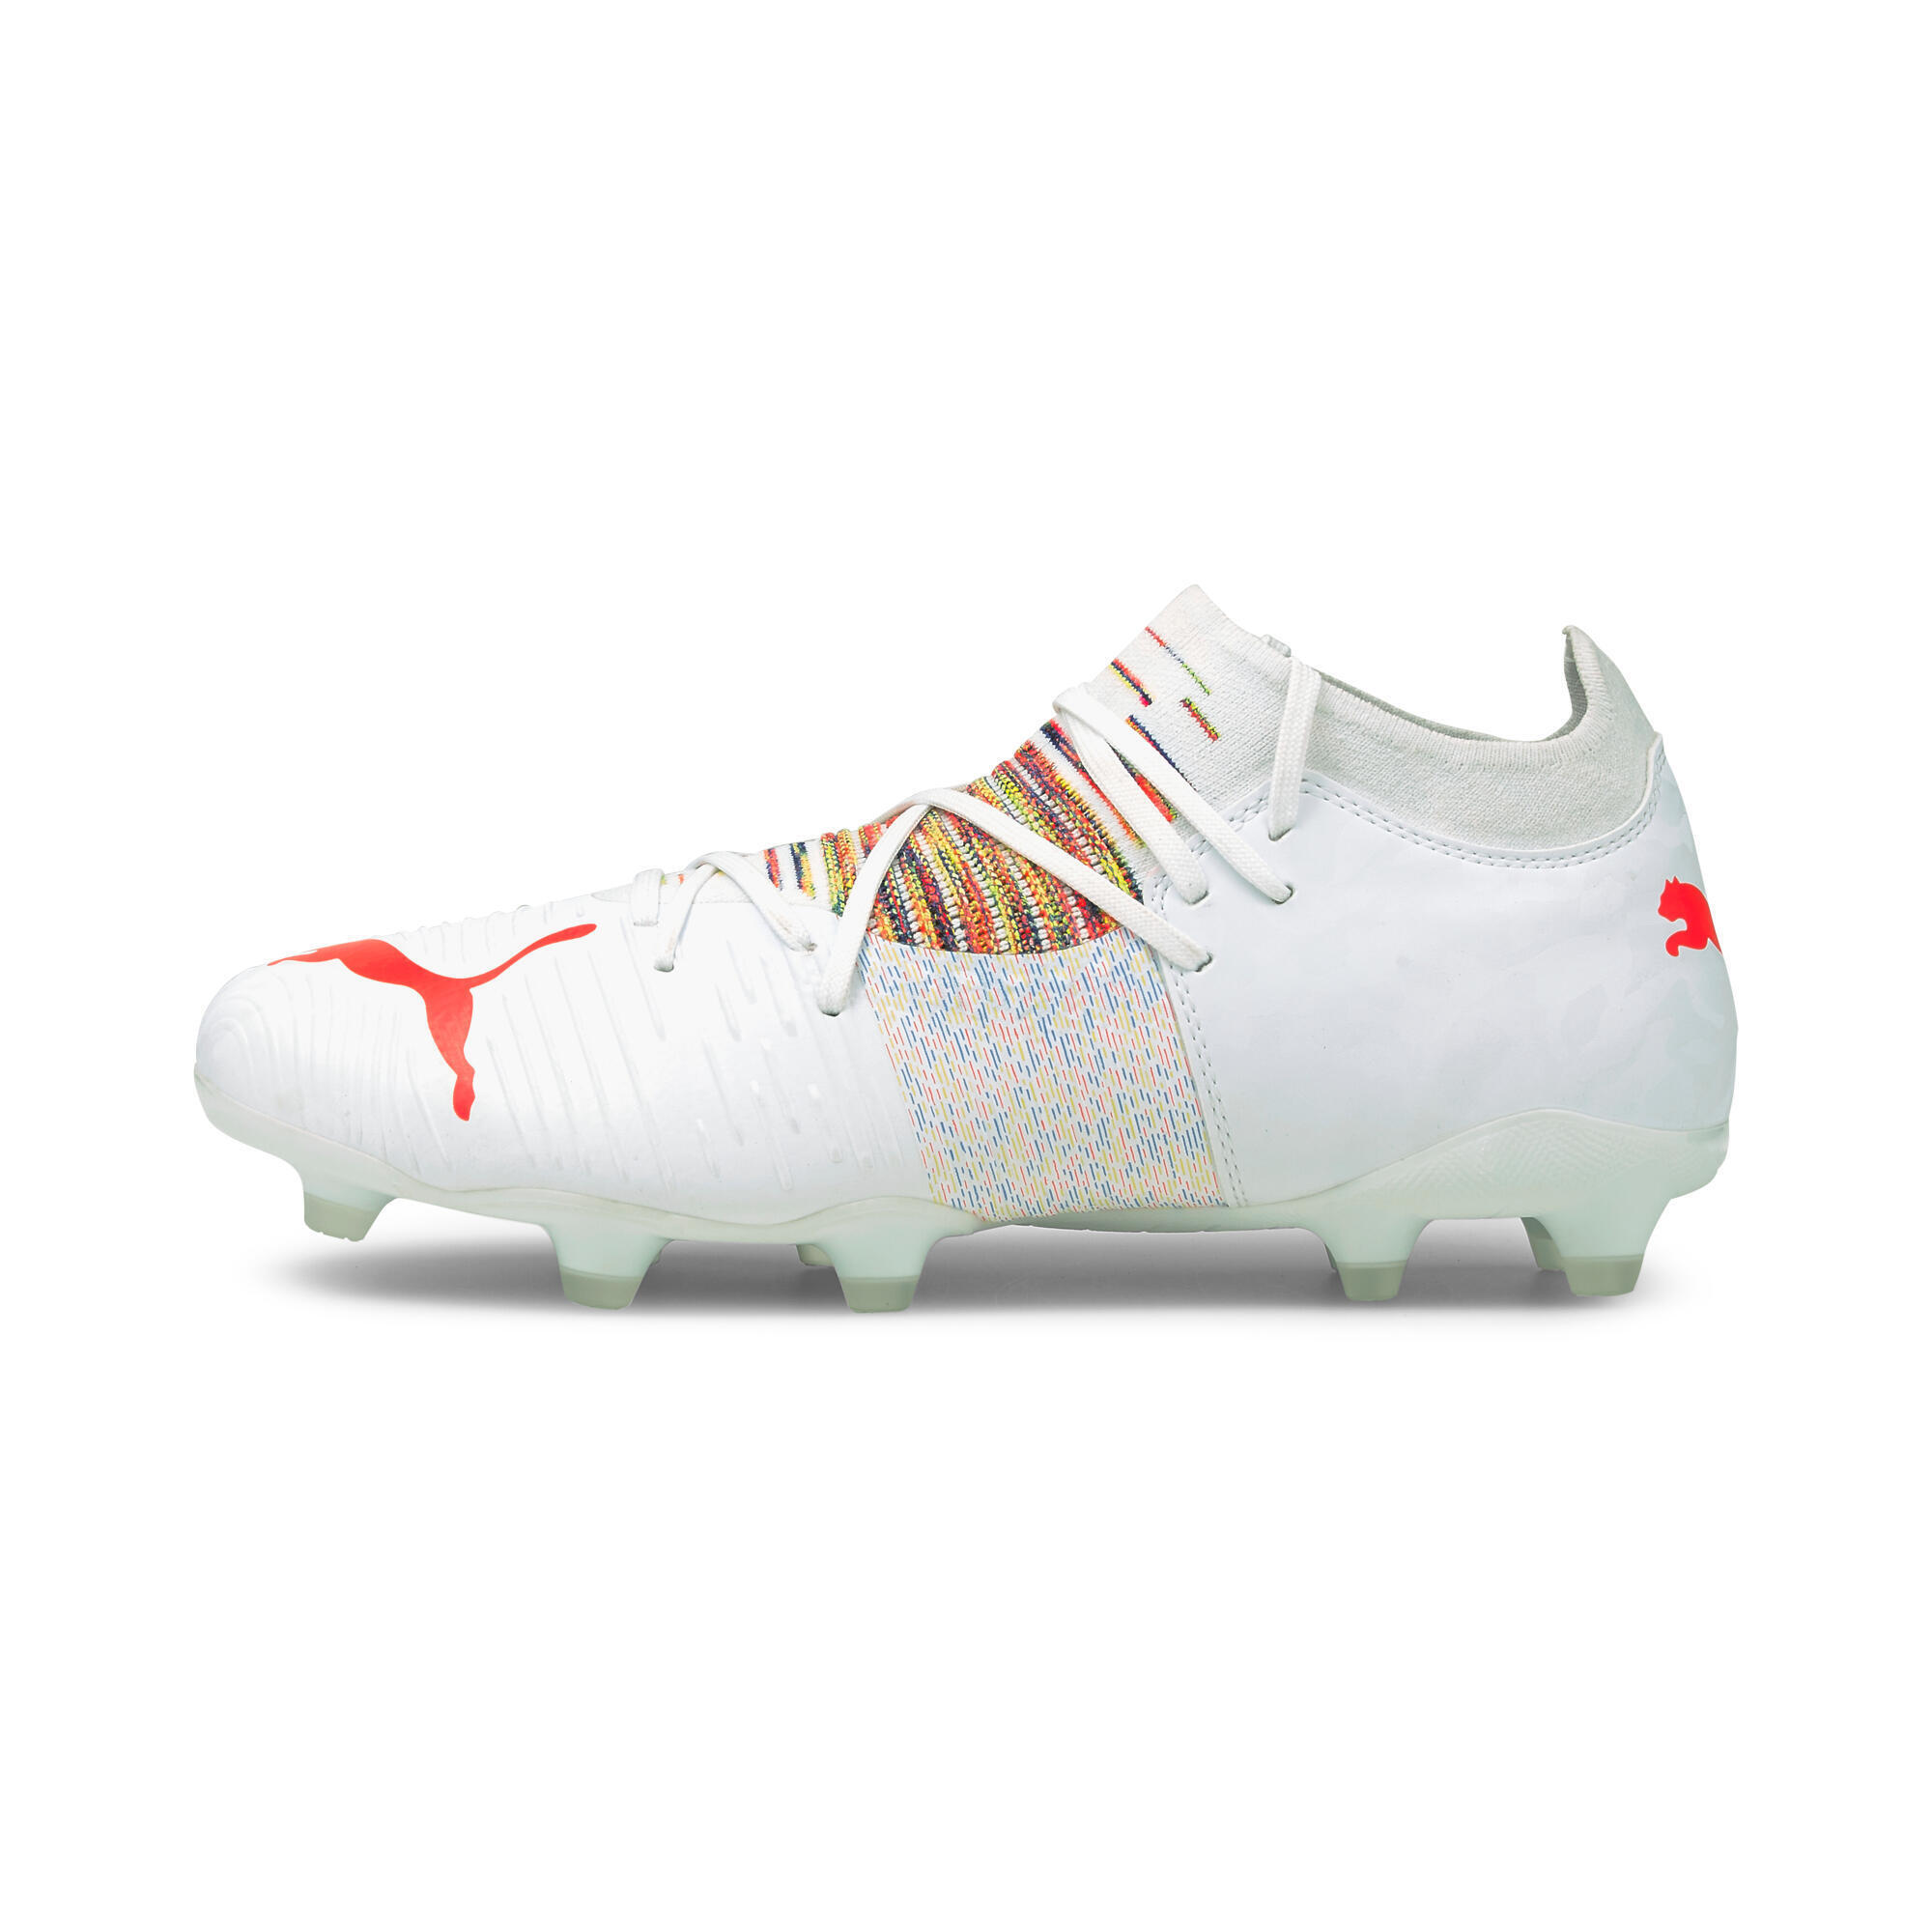 Chaussures de football FUTURE 3.1 FG/MG PUMA homme PUMA | Decathlon